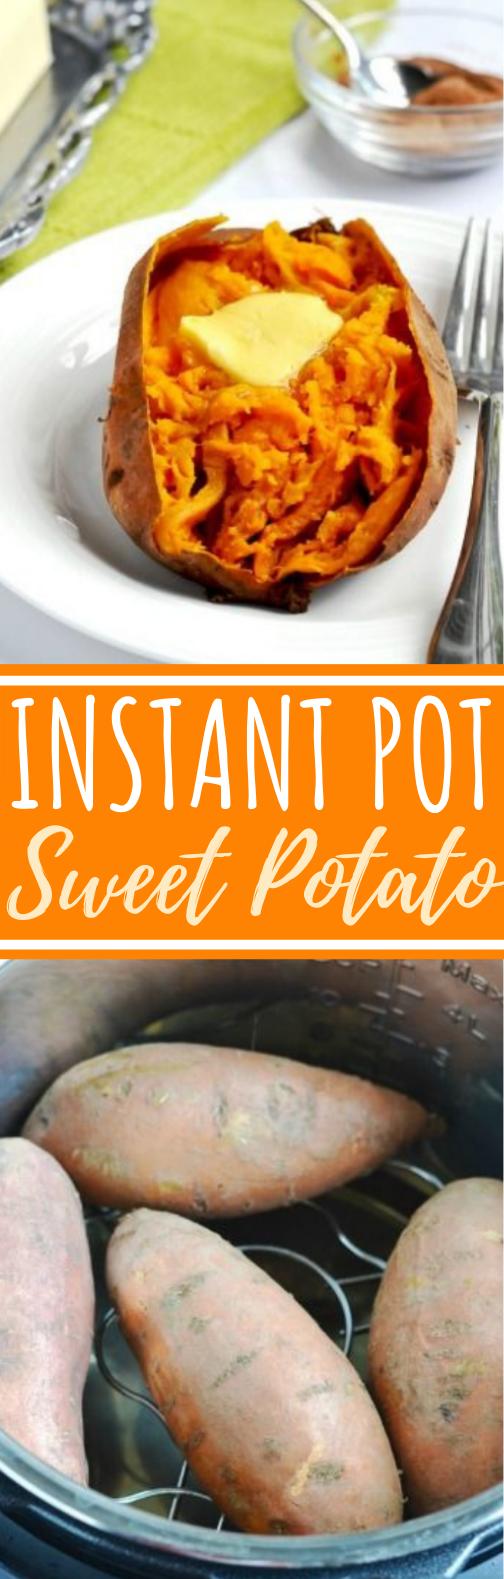 Instant Pot Sweet Potatoes #vegan #vegetarian #dinner #stew #glutenfree